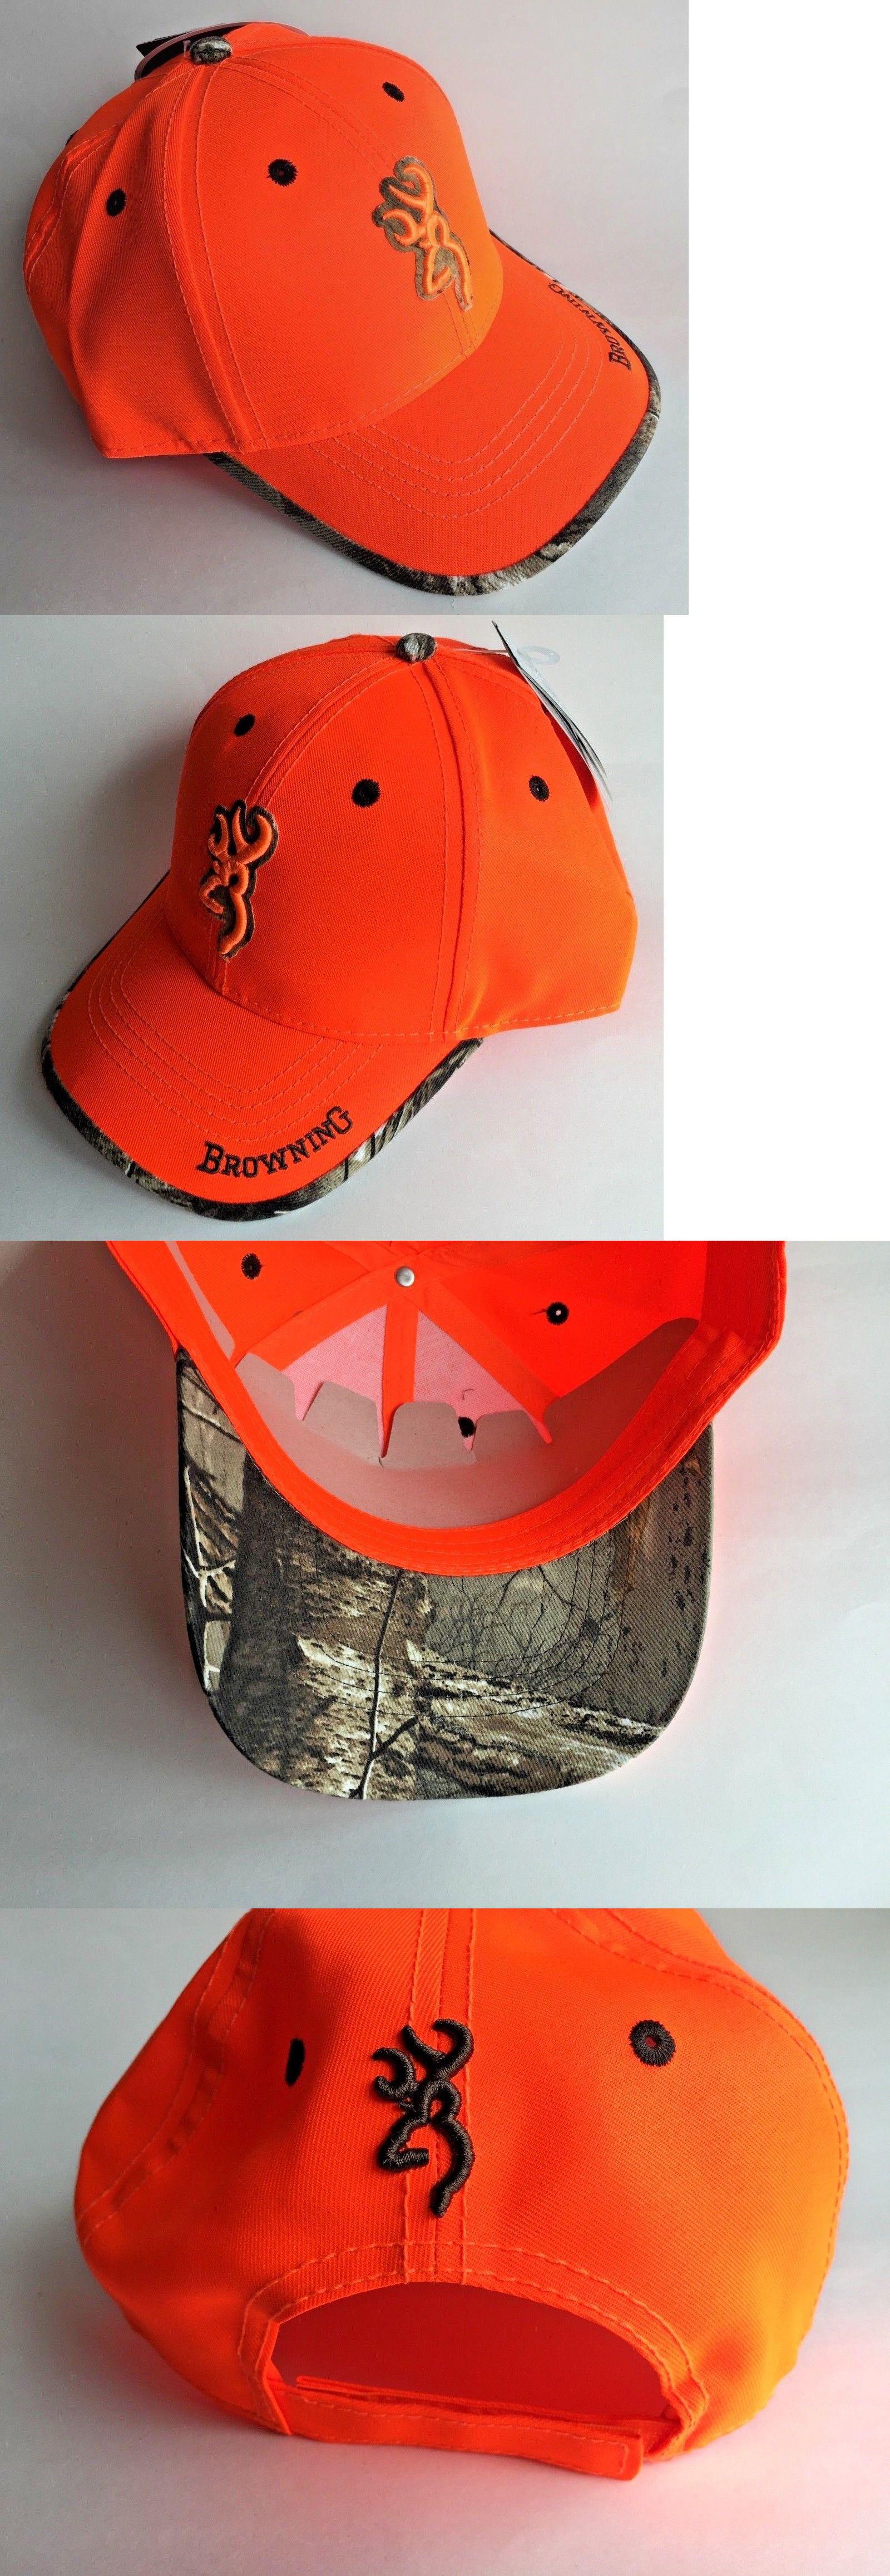 ... czech uk browning hunting hat new baseball cap sure shot blaze orange  308380011 rtx 3de78 60bf3 ee619476934a